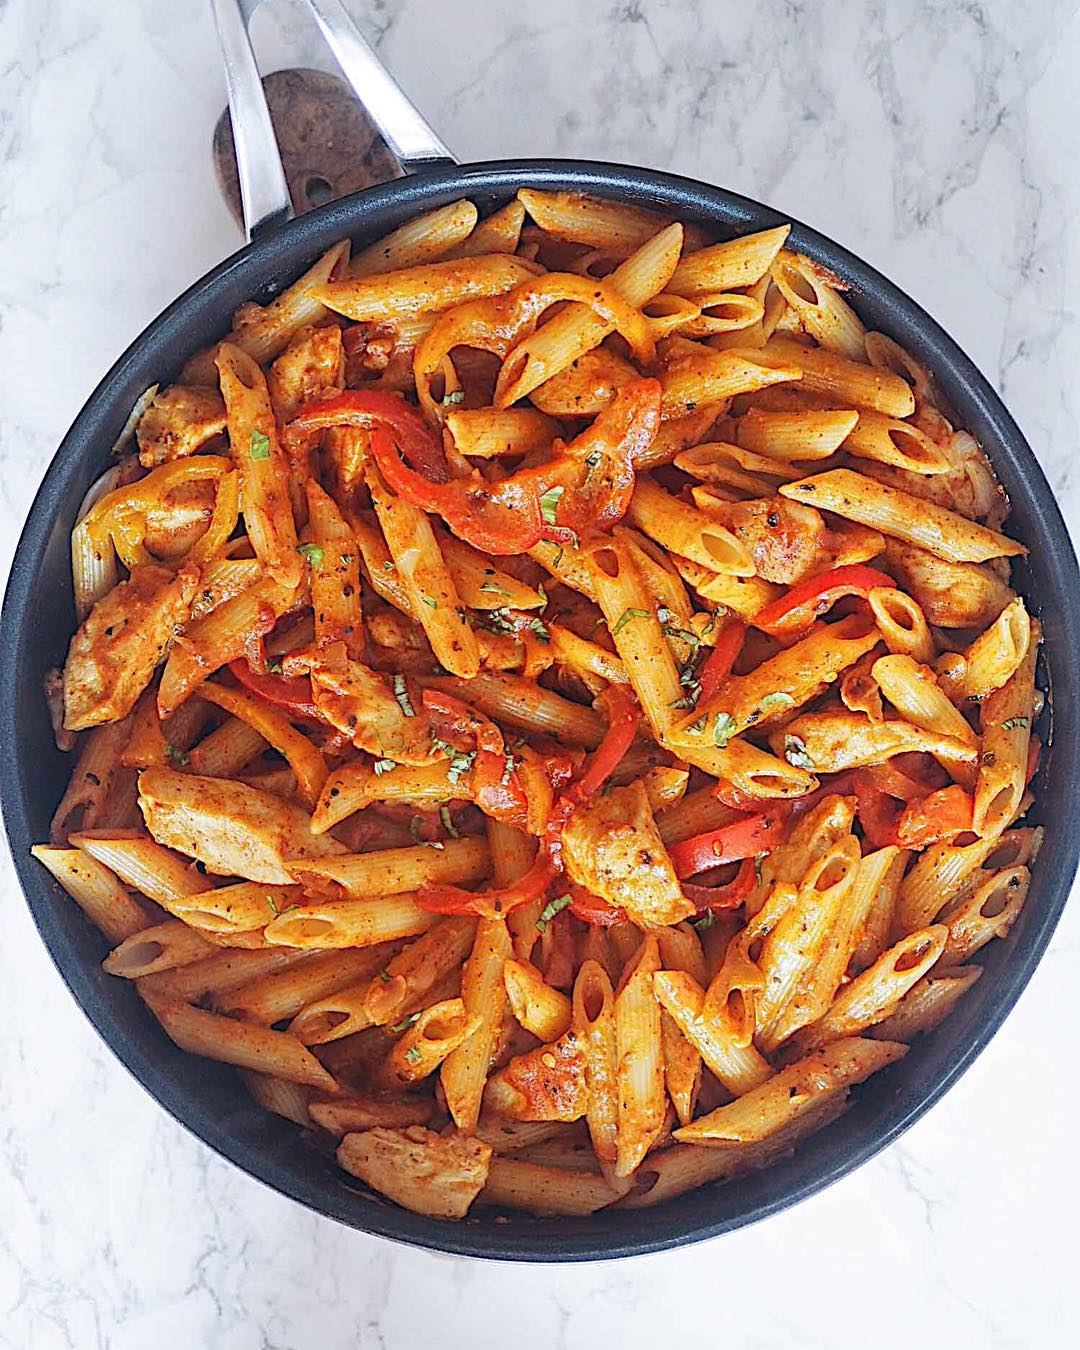 fajita pastastep-by-step recipe